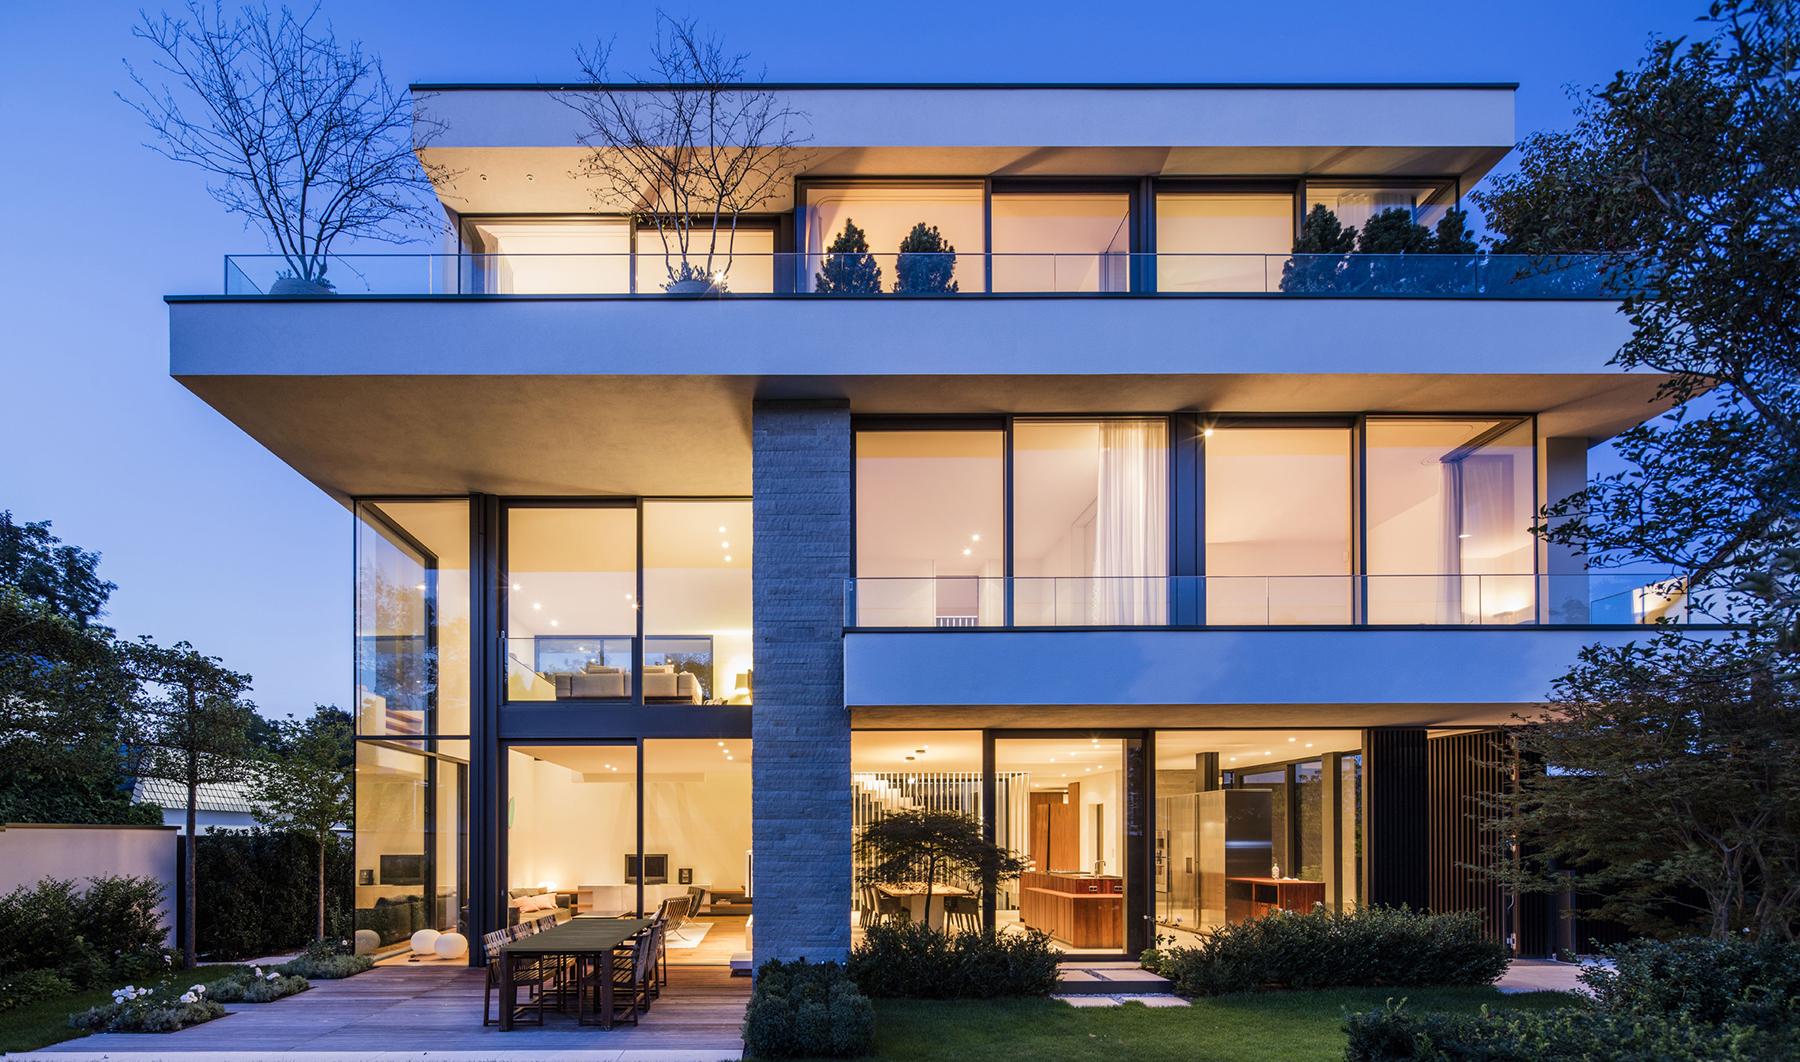 Projekt haus ti frankfurt architekten bda fuchs wacker for Architektur frankfurt